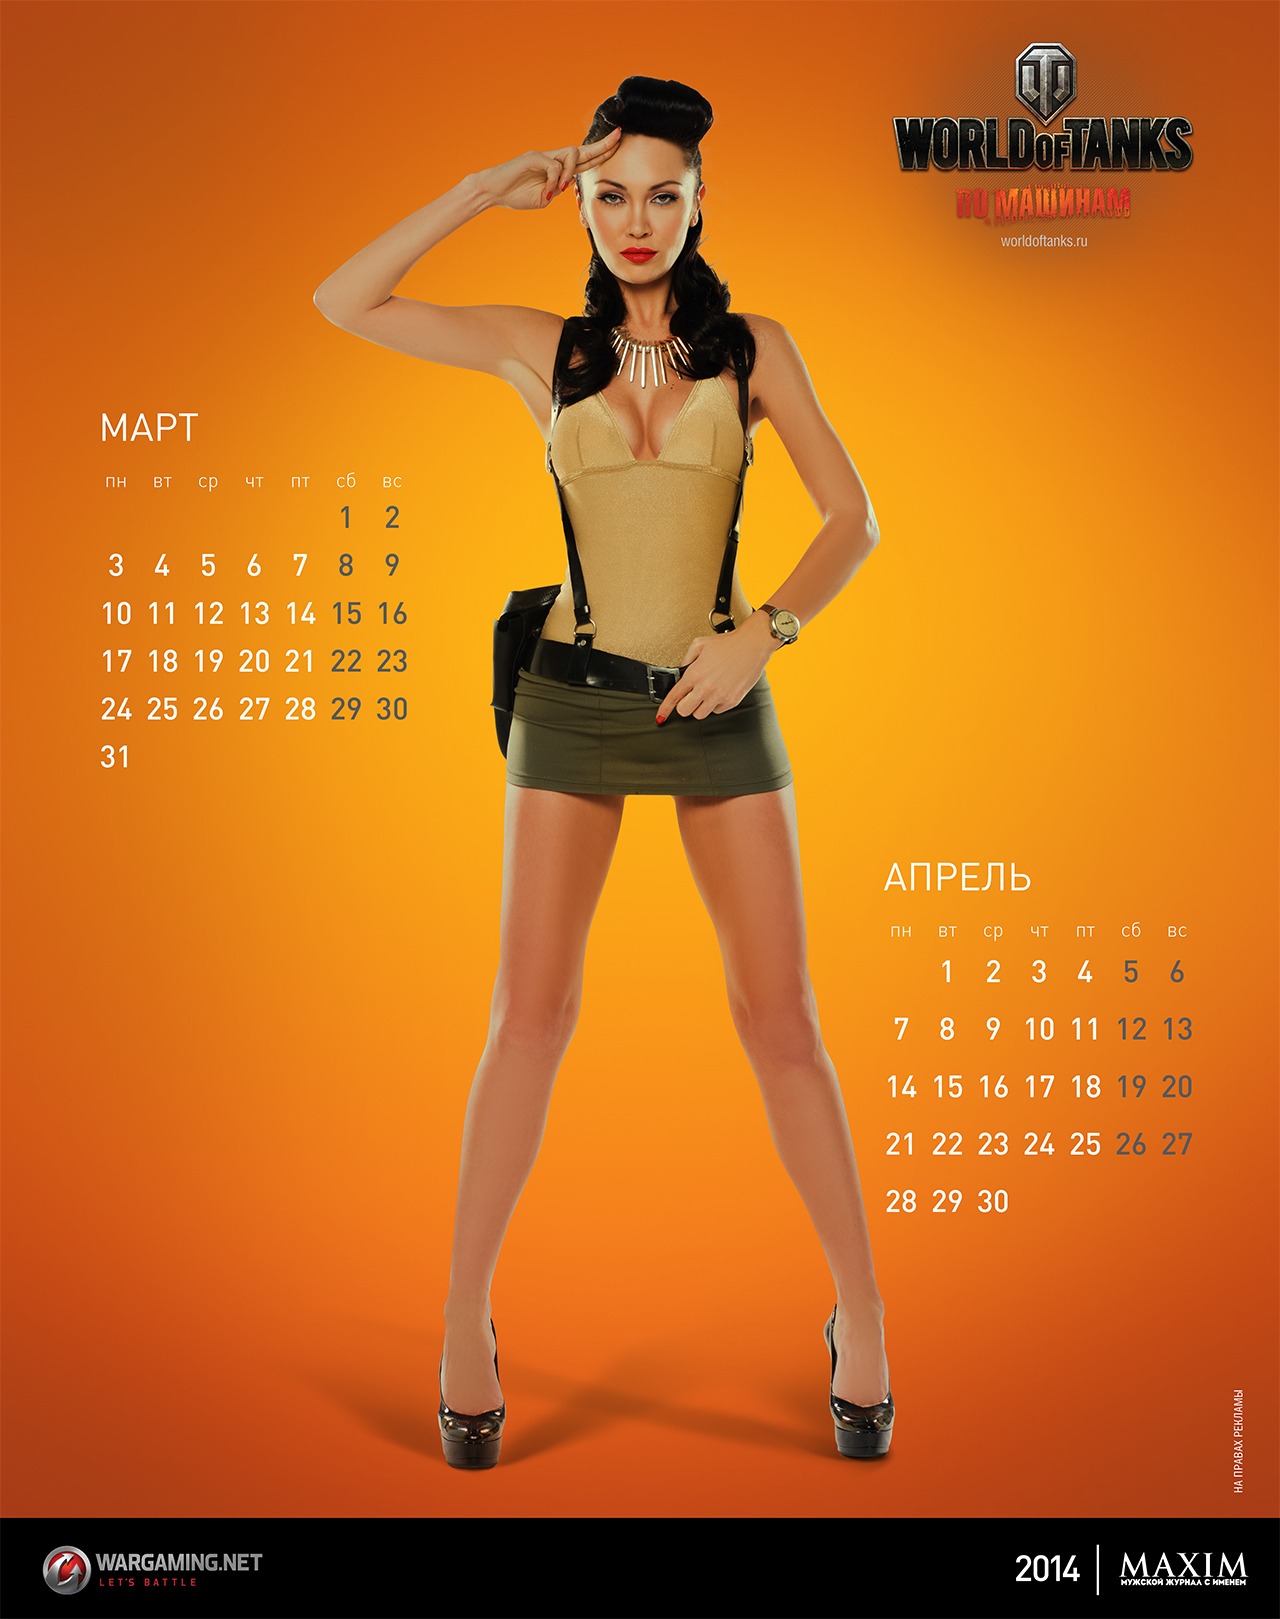 Фотка на рено нарисована голая женщина